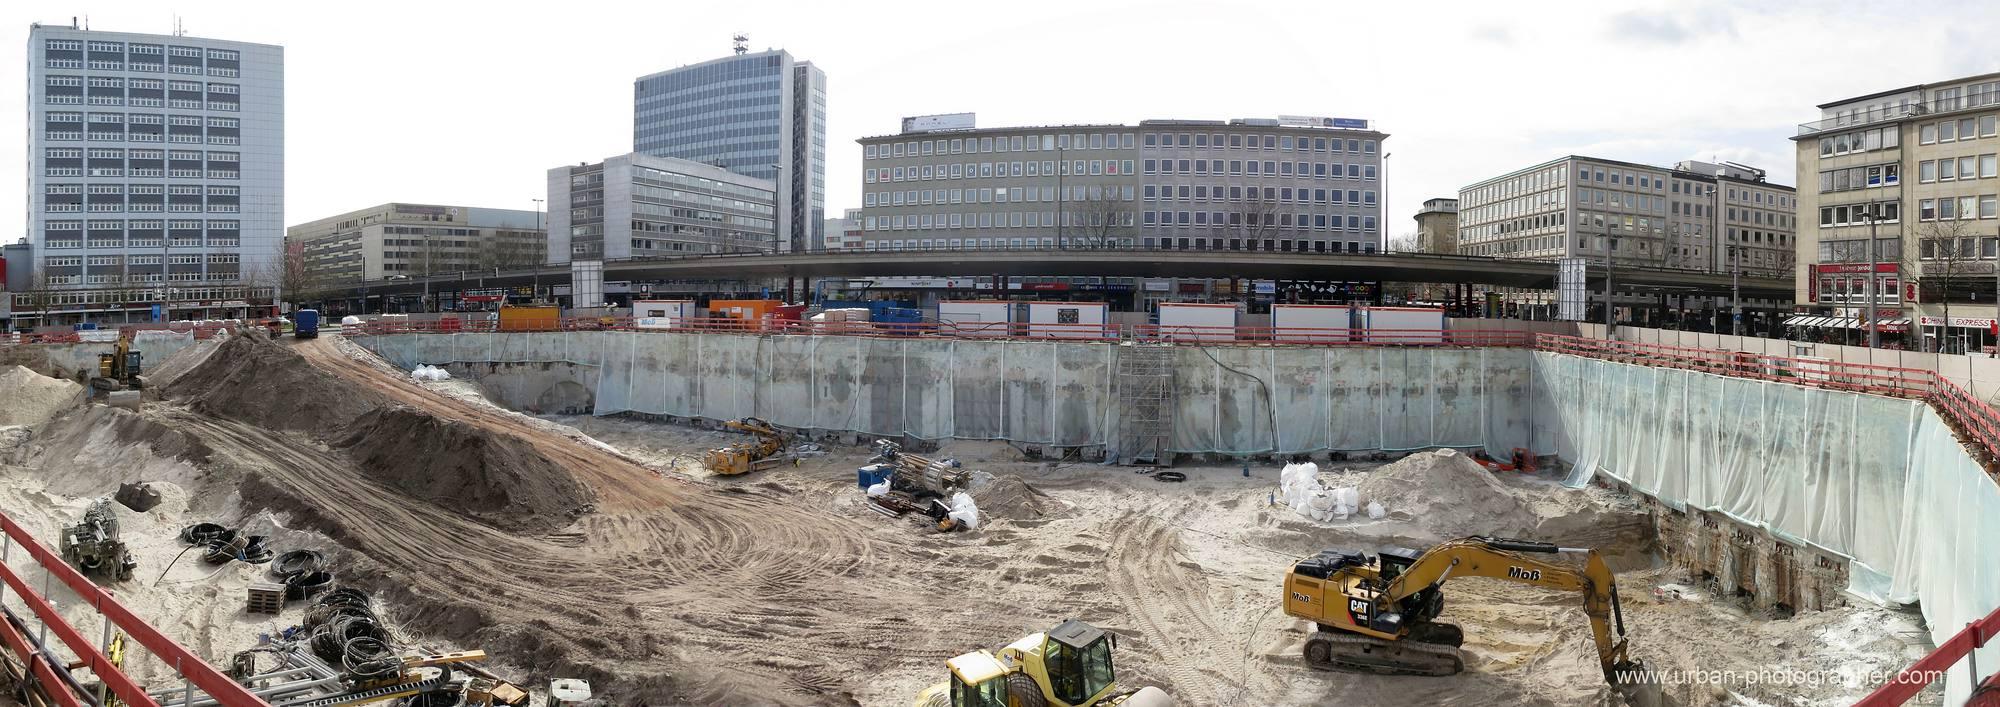 Baustelle Bahnhofsplatz 35